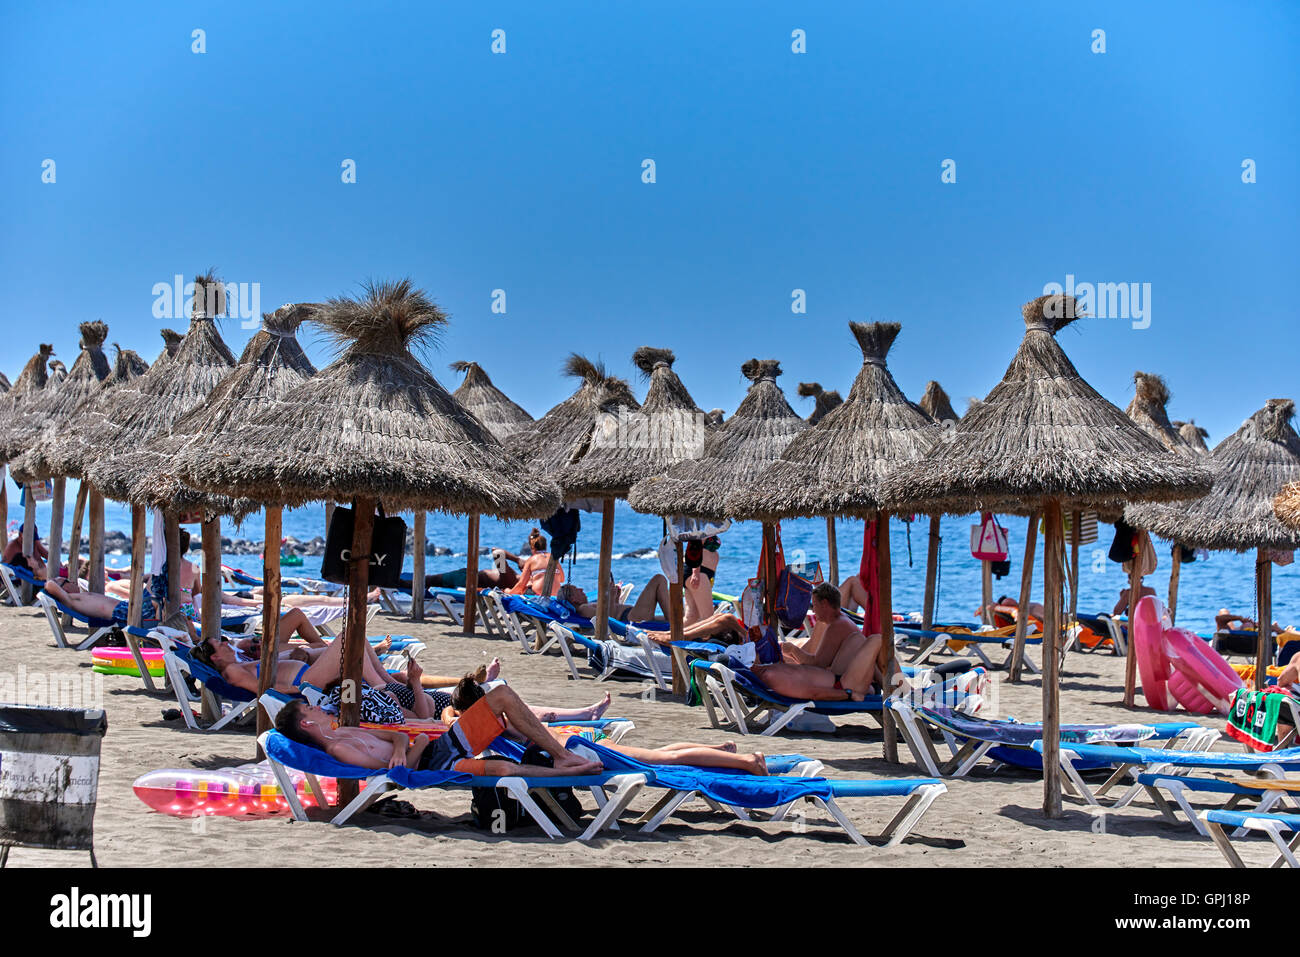 Hotel jardin tropical costa adeje tenerife stock photo royalty free image 117180806 alamy - Jardin tropical costa adeje ...